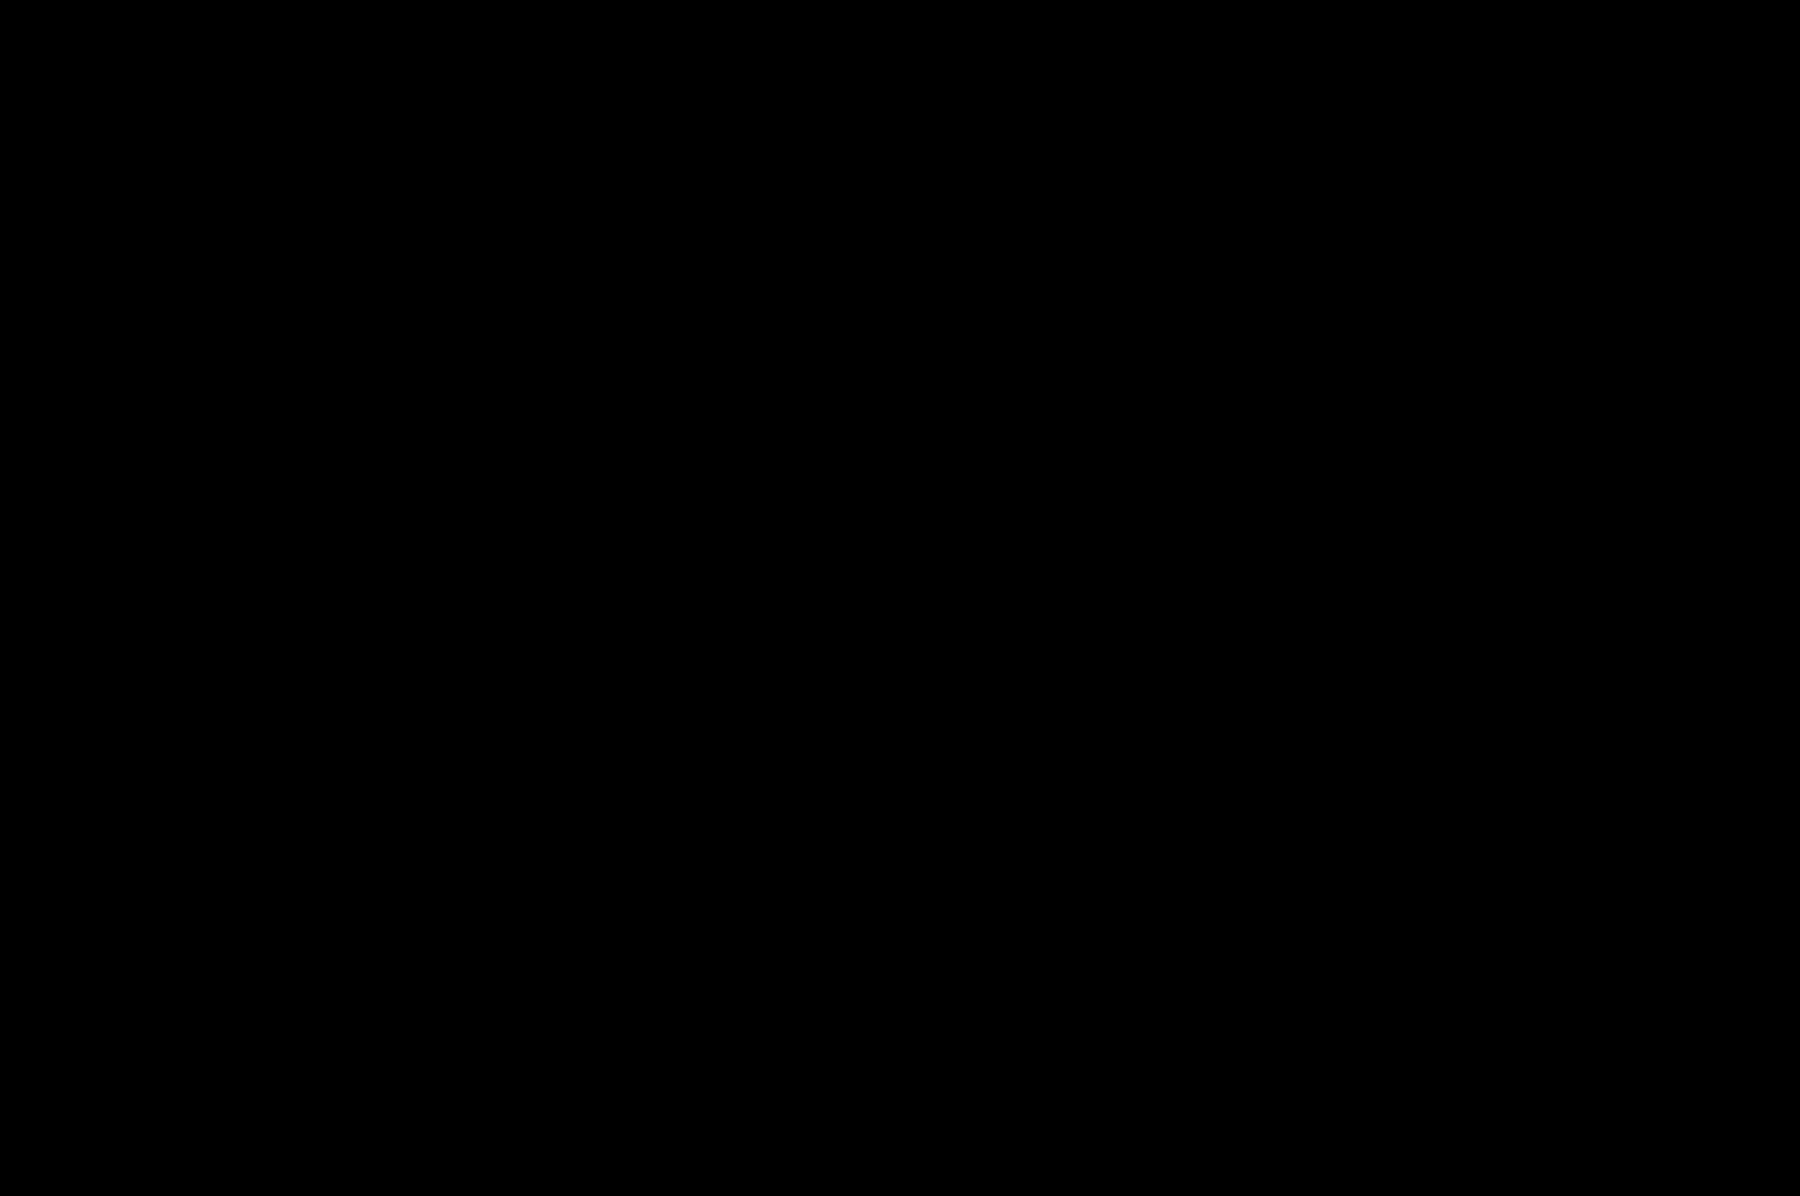 Косметичка квіти на чорному